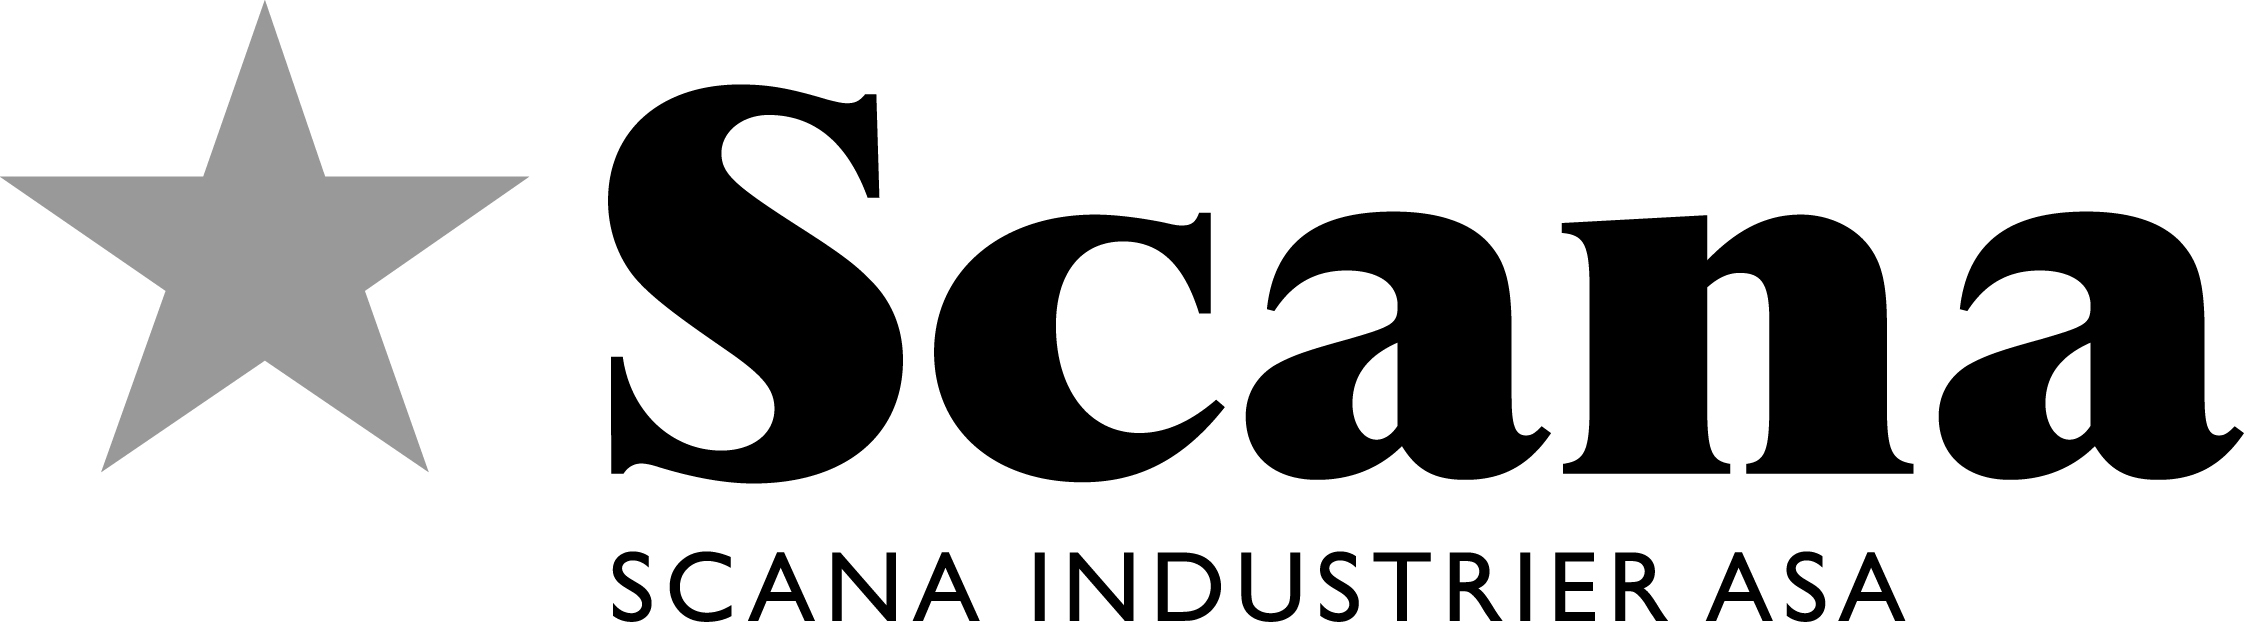 Scana-Industrier-ASA_org_logo.jpg